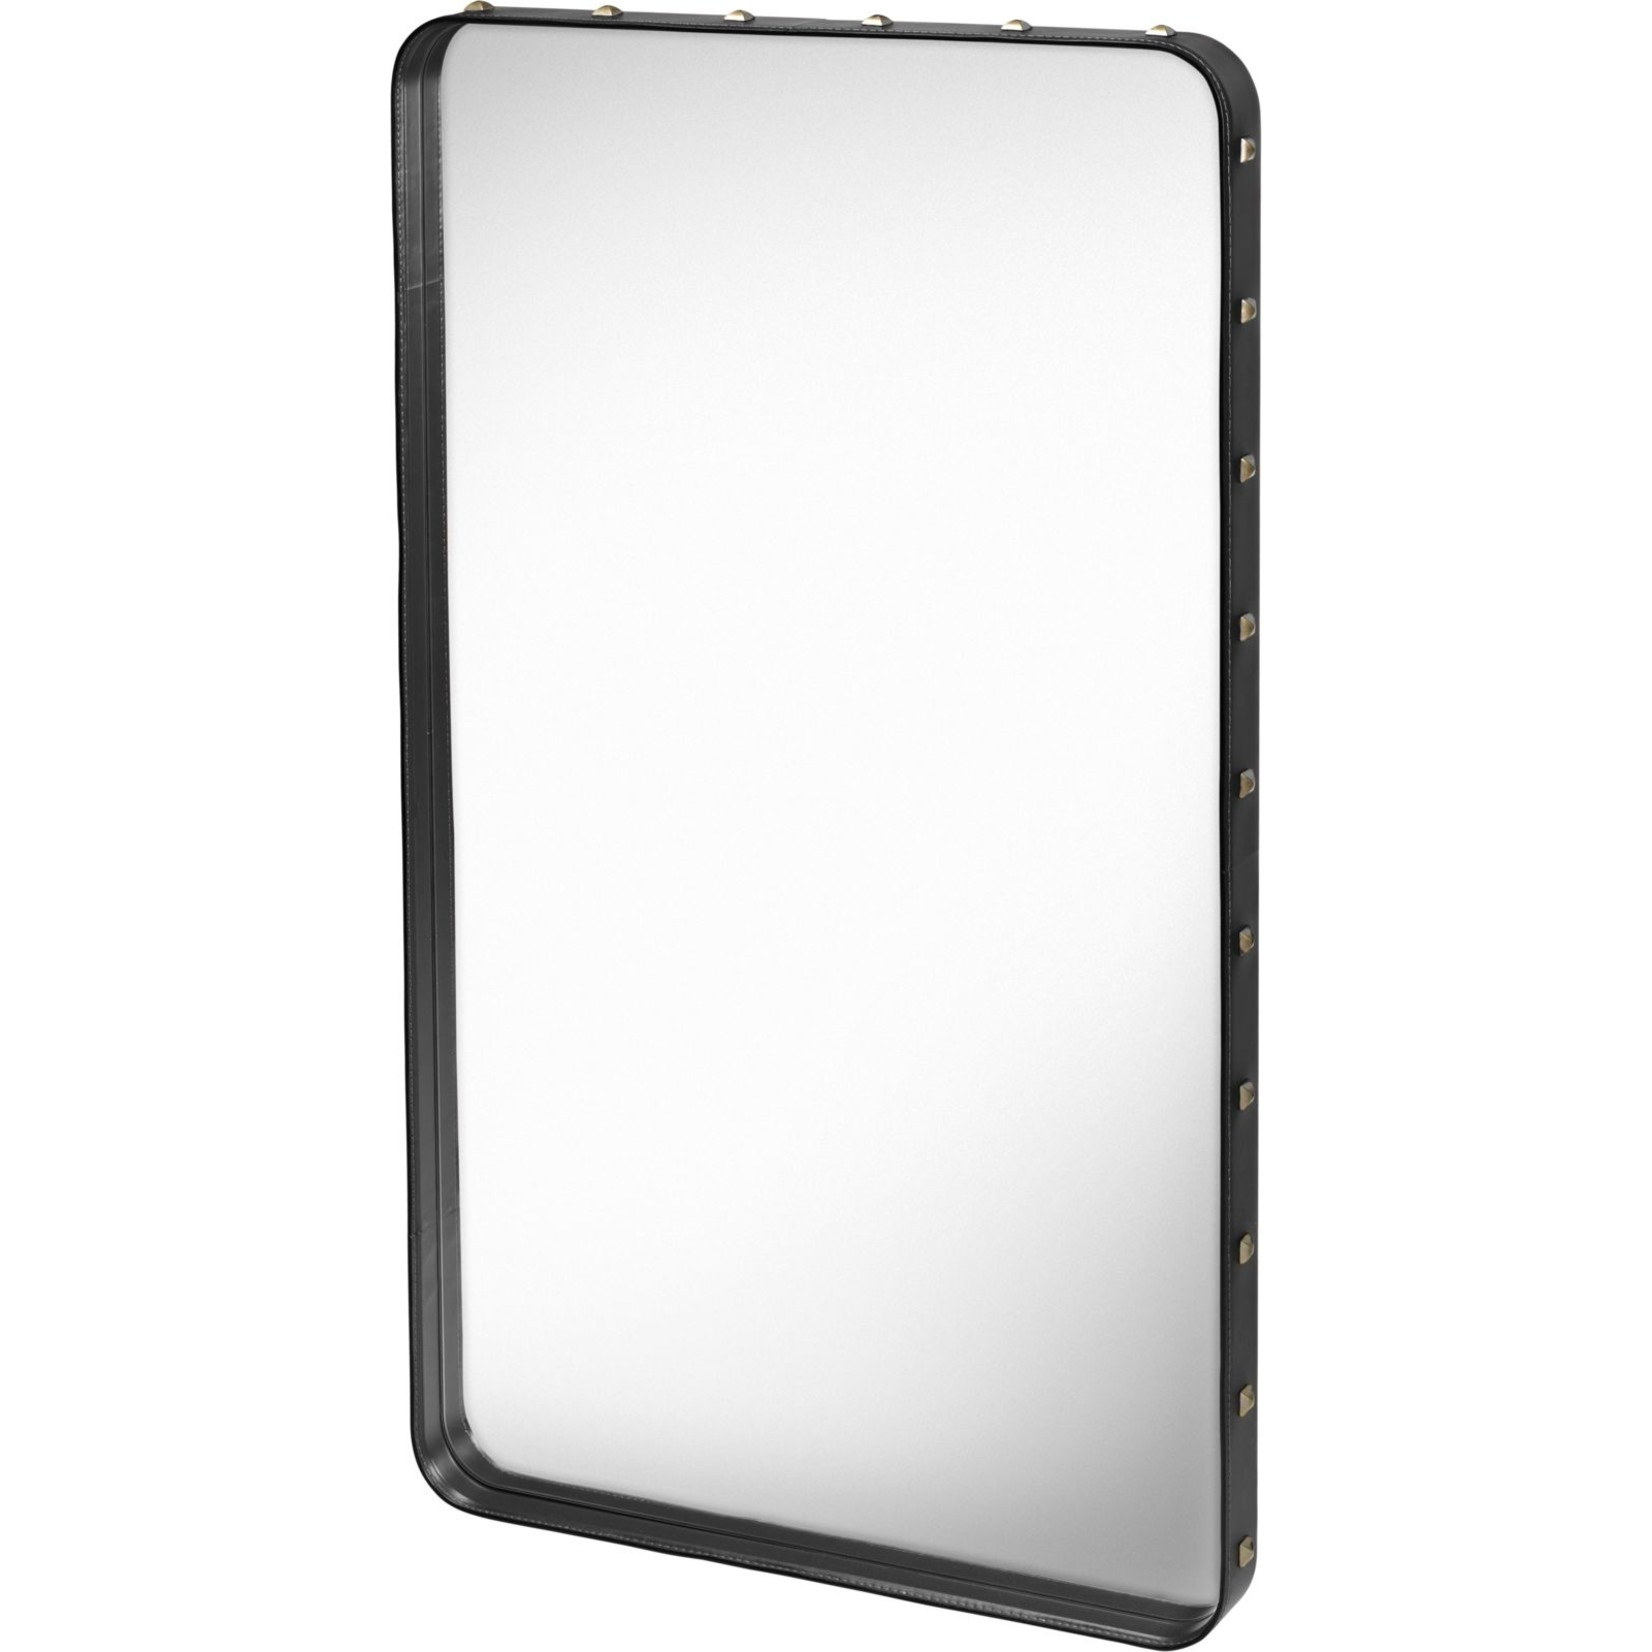 Gubi Wall mirror Adnet - Rectangular - 65x115 - Black Leather